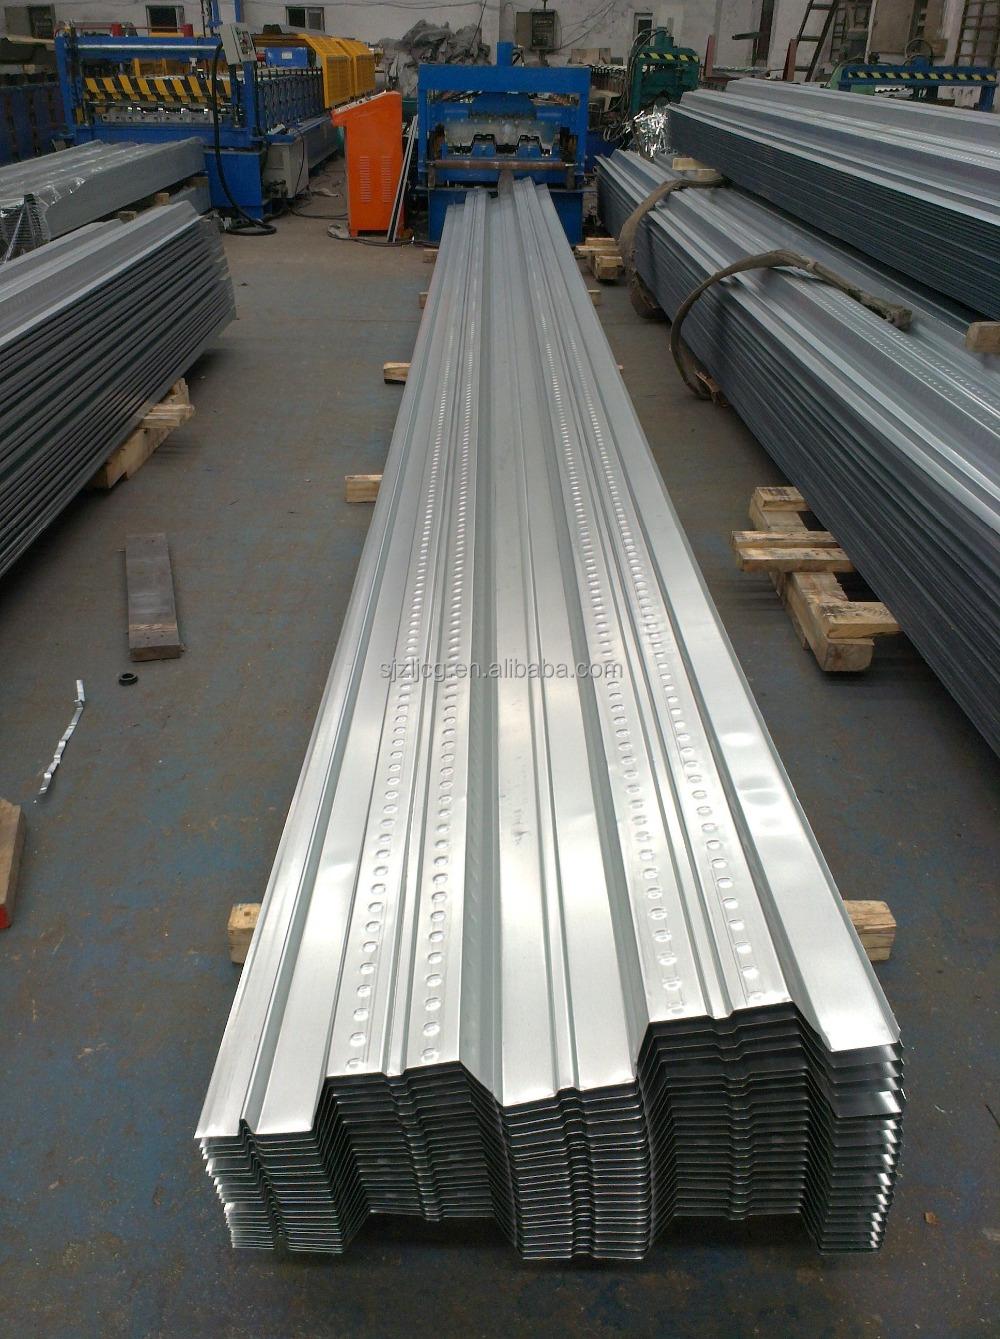 Steel Decking Slab : Steel decking design buy metal deck construction